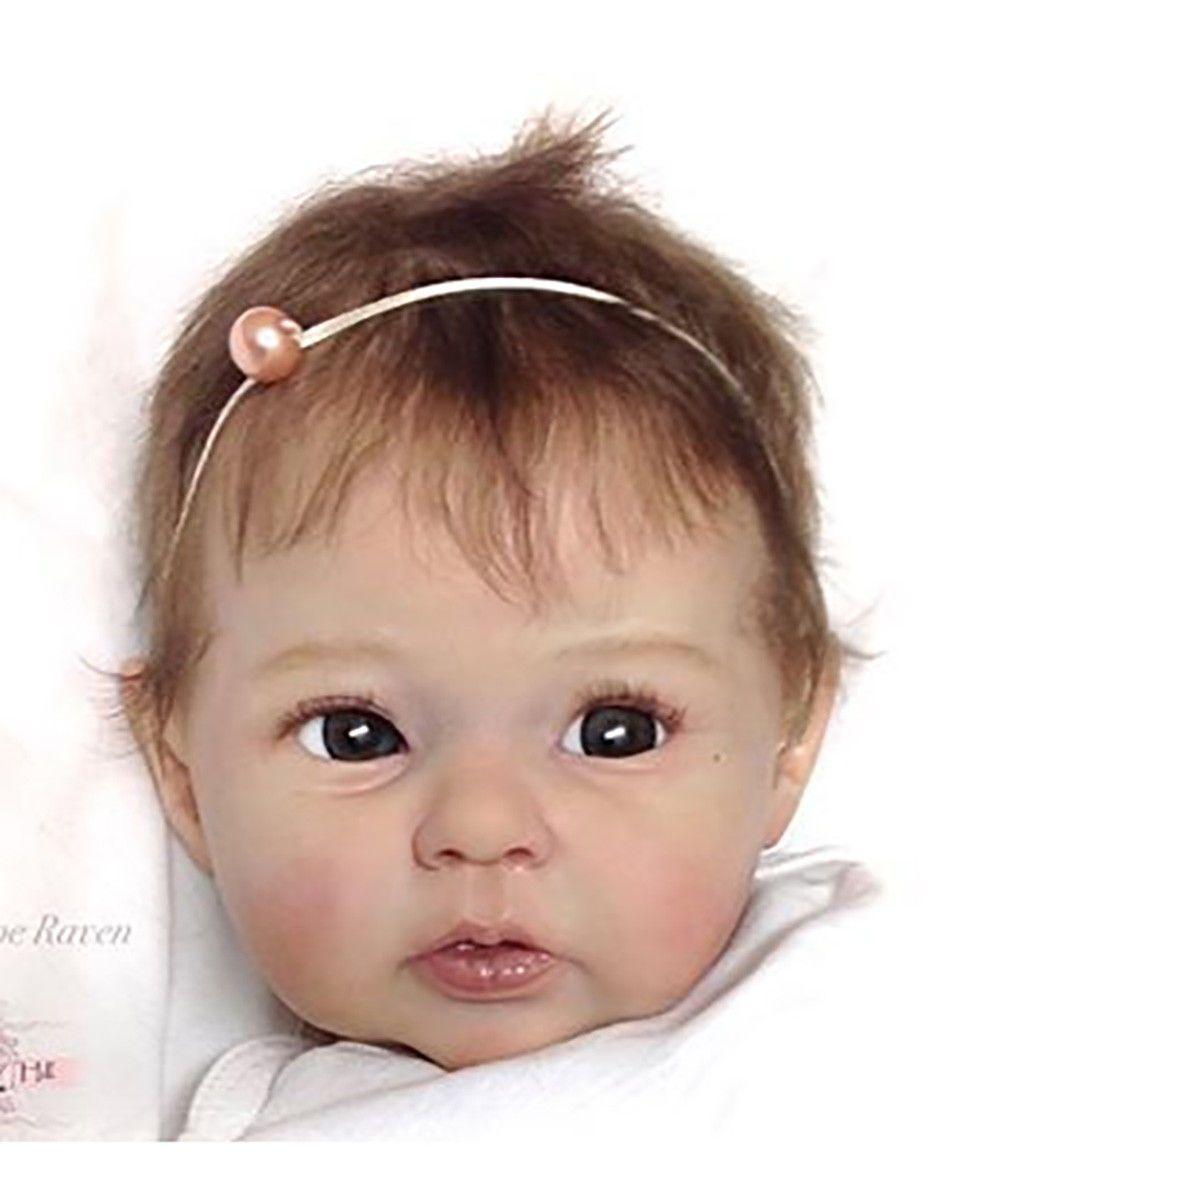 20/'/' Unpainted Reborn Baby Doll Kits Soft Silicone Vinyl Head Arms Legs Supplies